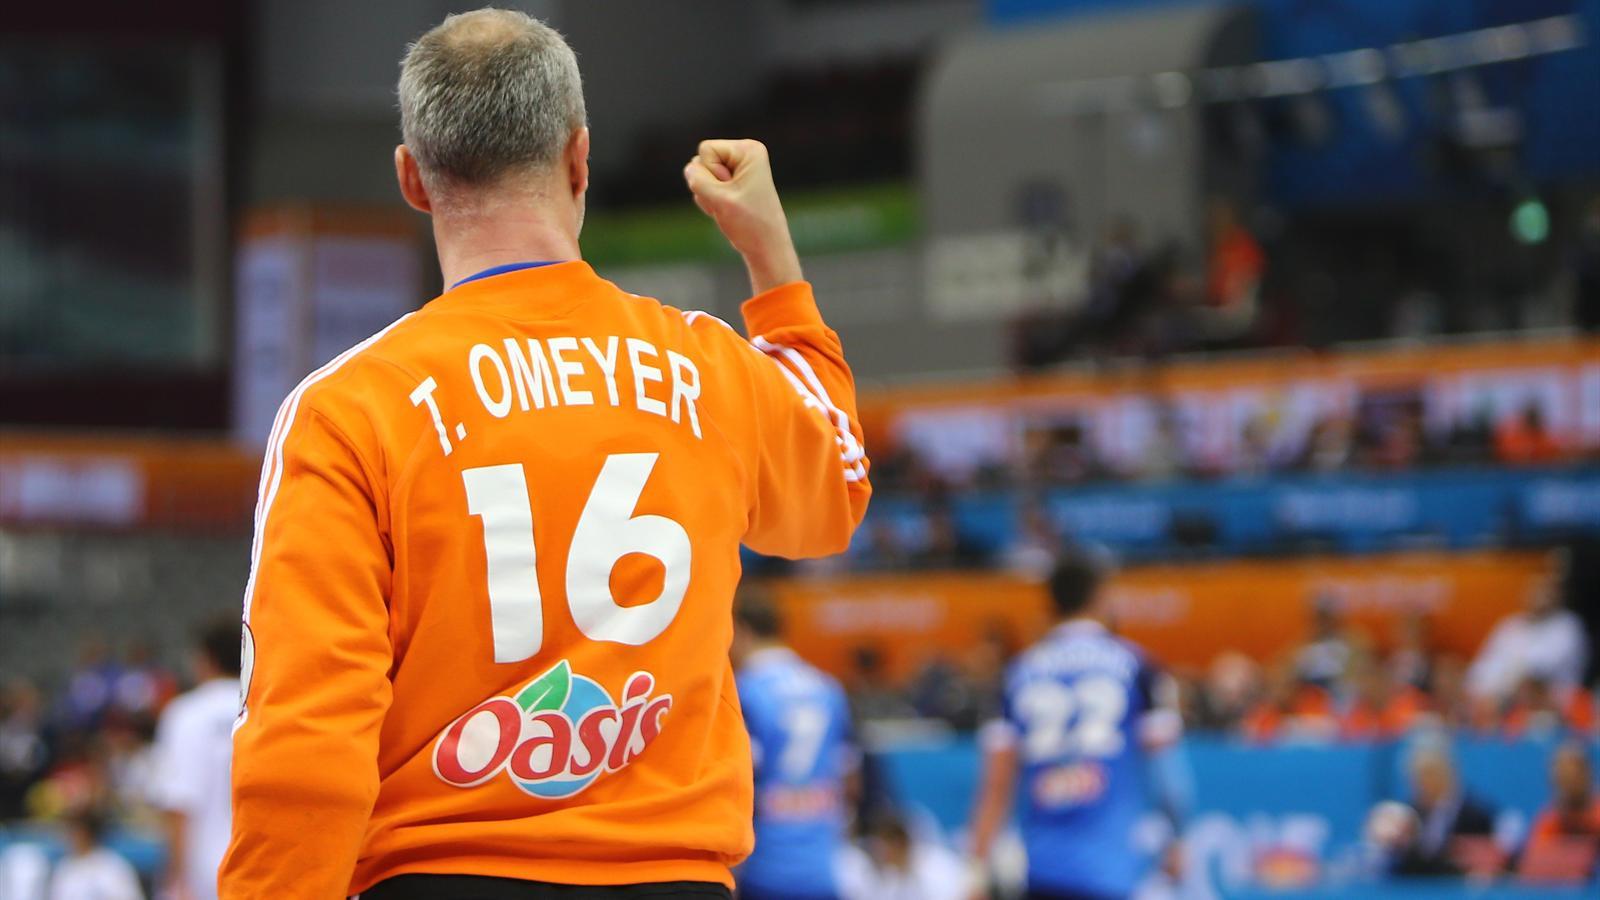 Thierry omeyer l 39 inusable gardien du temple bleu handball eurosport - Diffusion coupe du monde handball 2015 ...